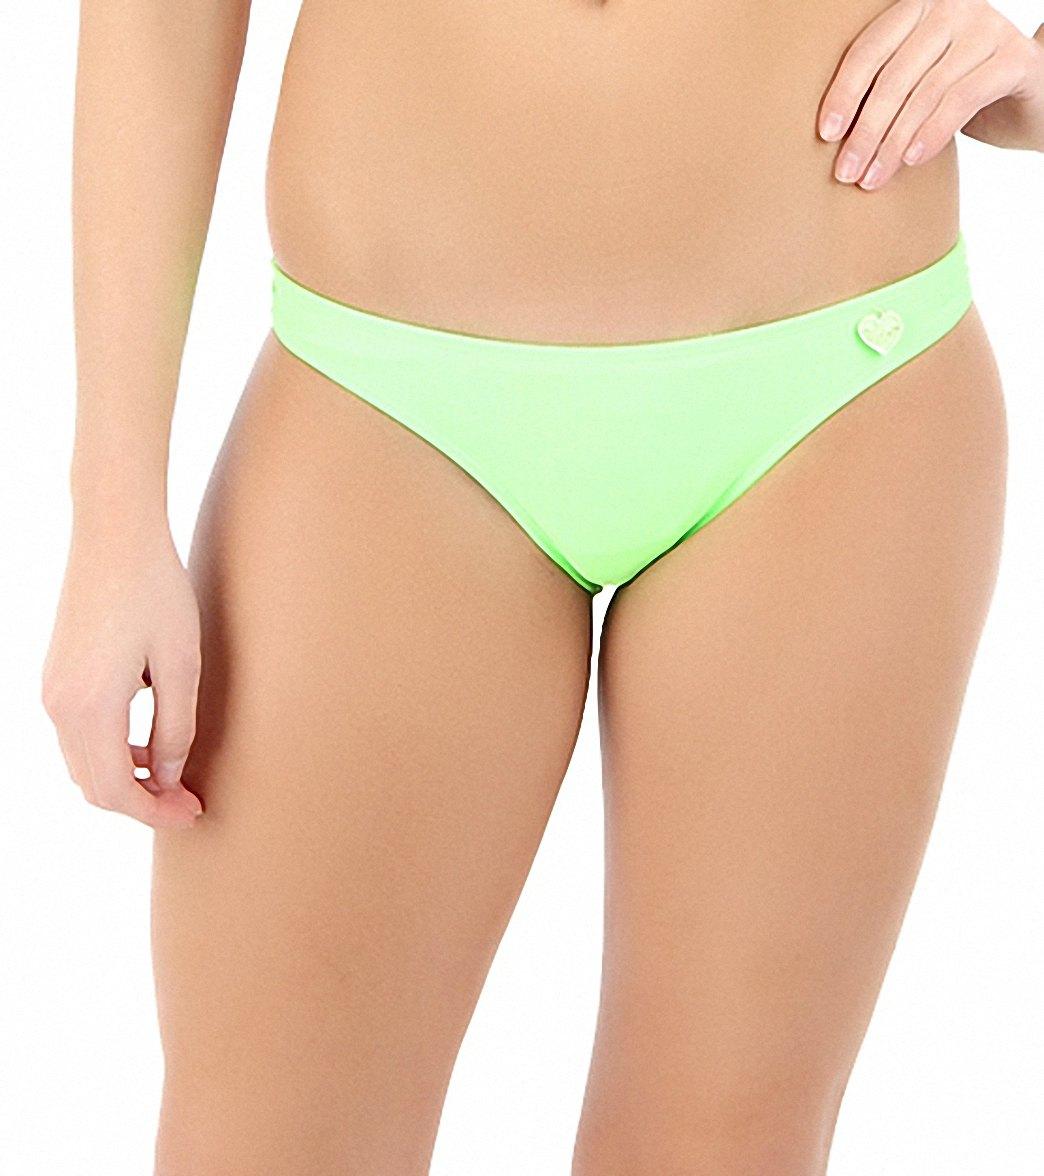 f38a31ea4a Body Glove Swimwear Womens Smoothies Super Brights Fiji Bikini ...